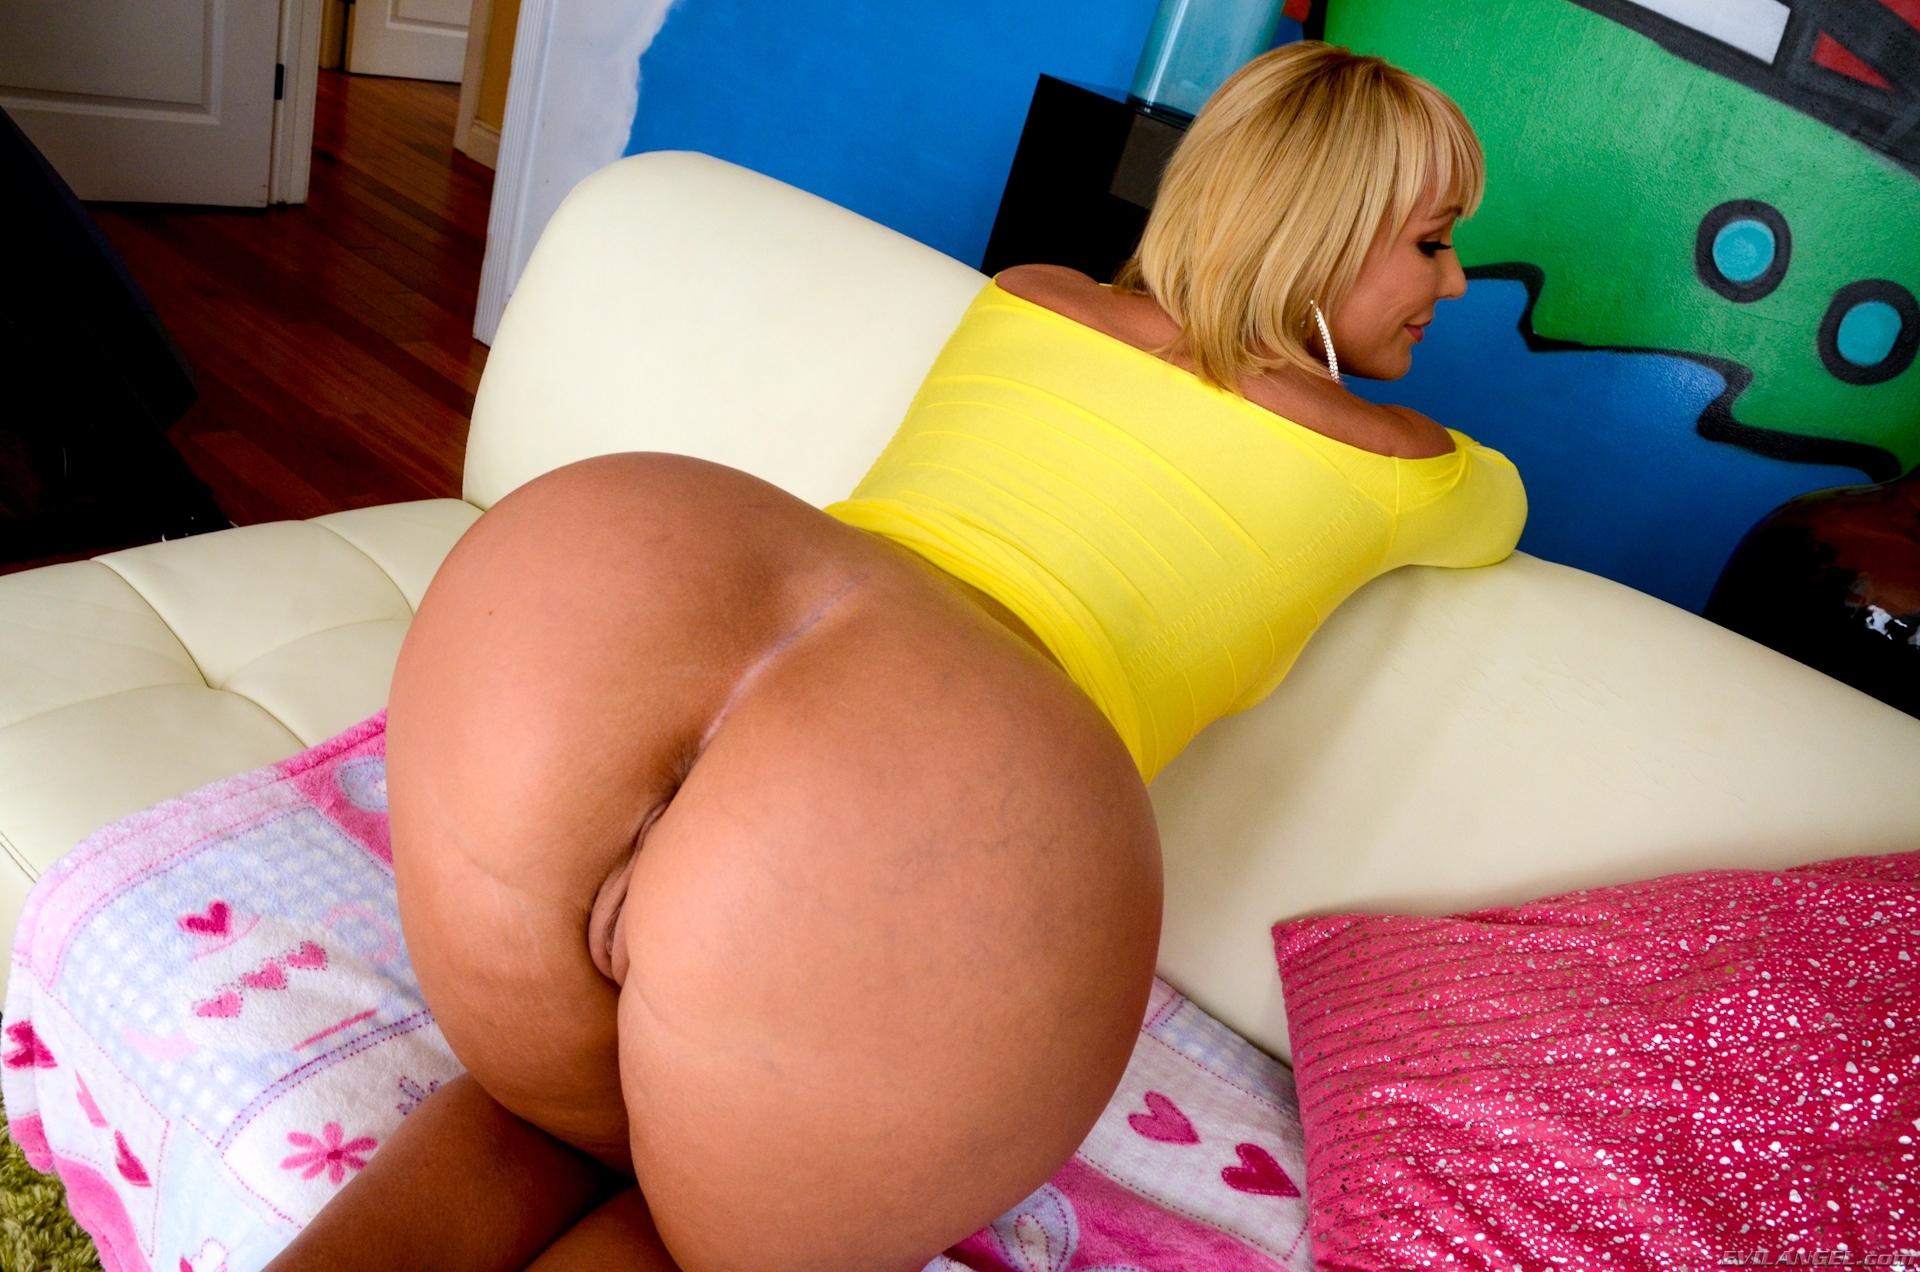 Tracey bregman nude